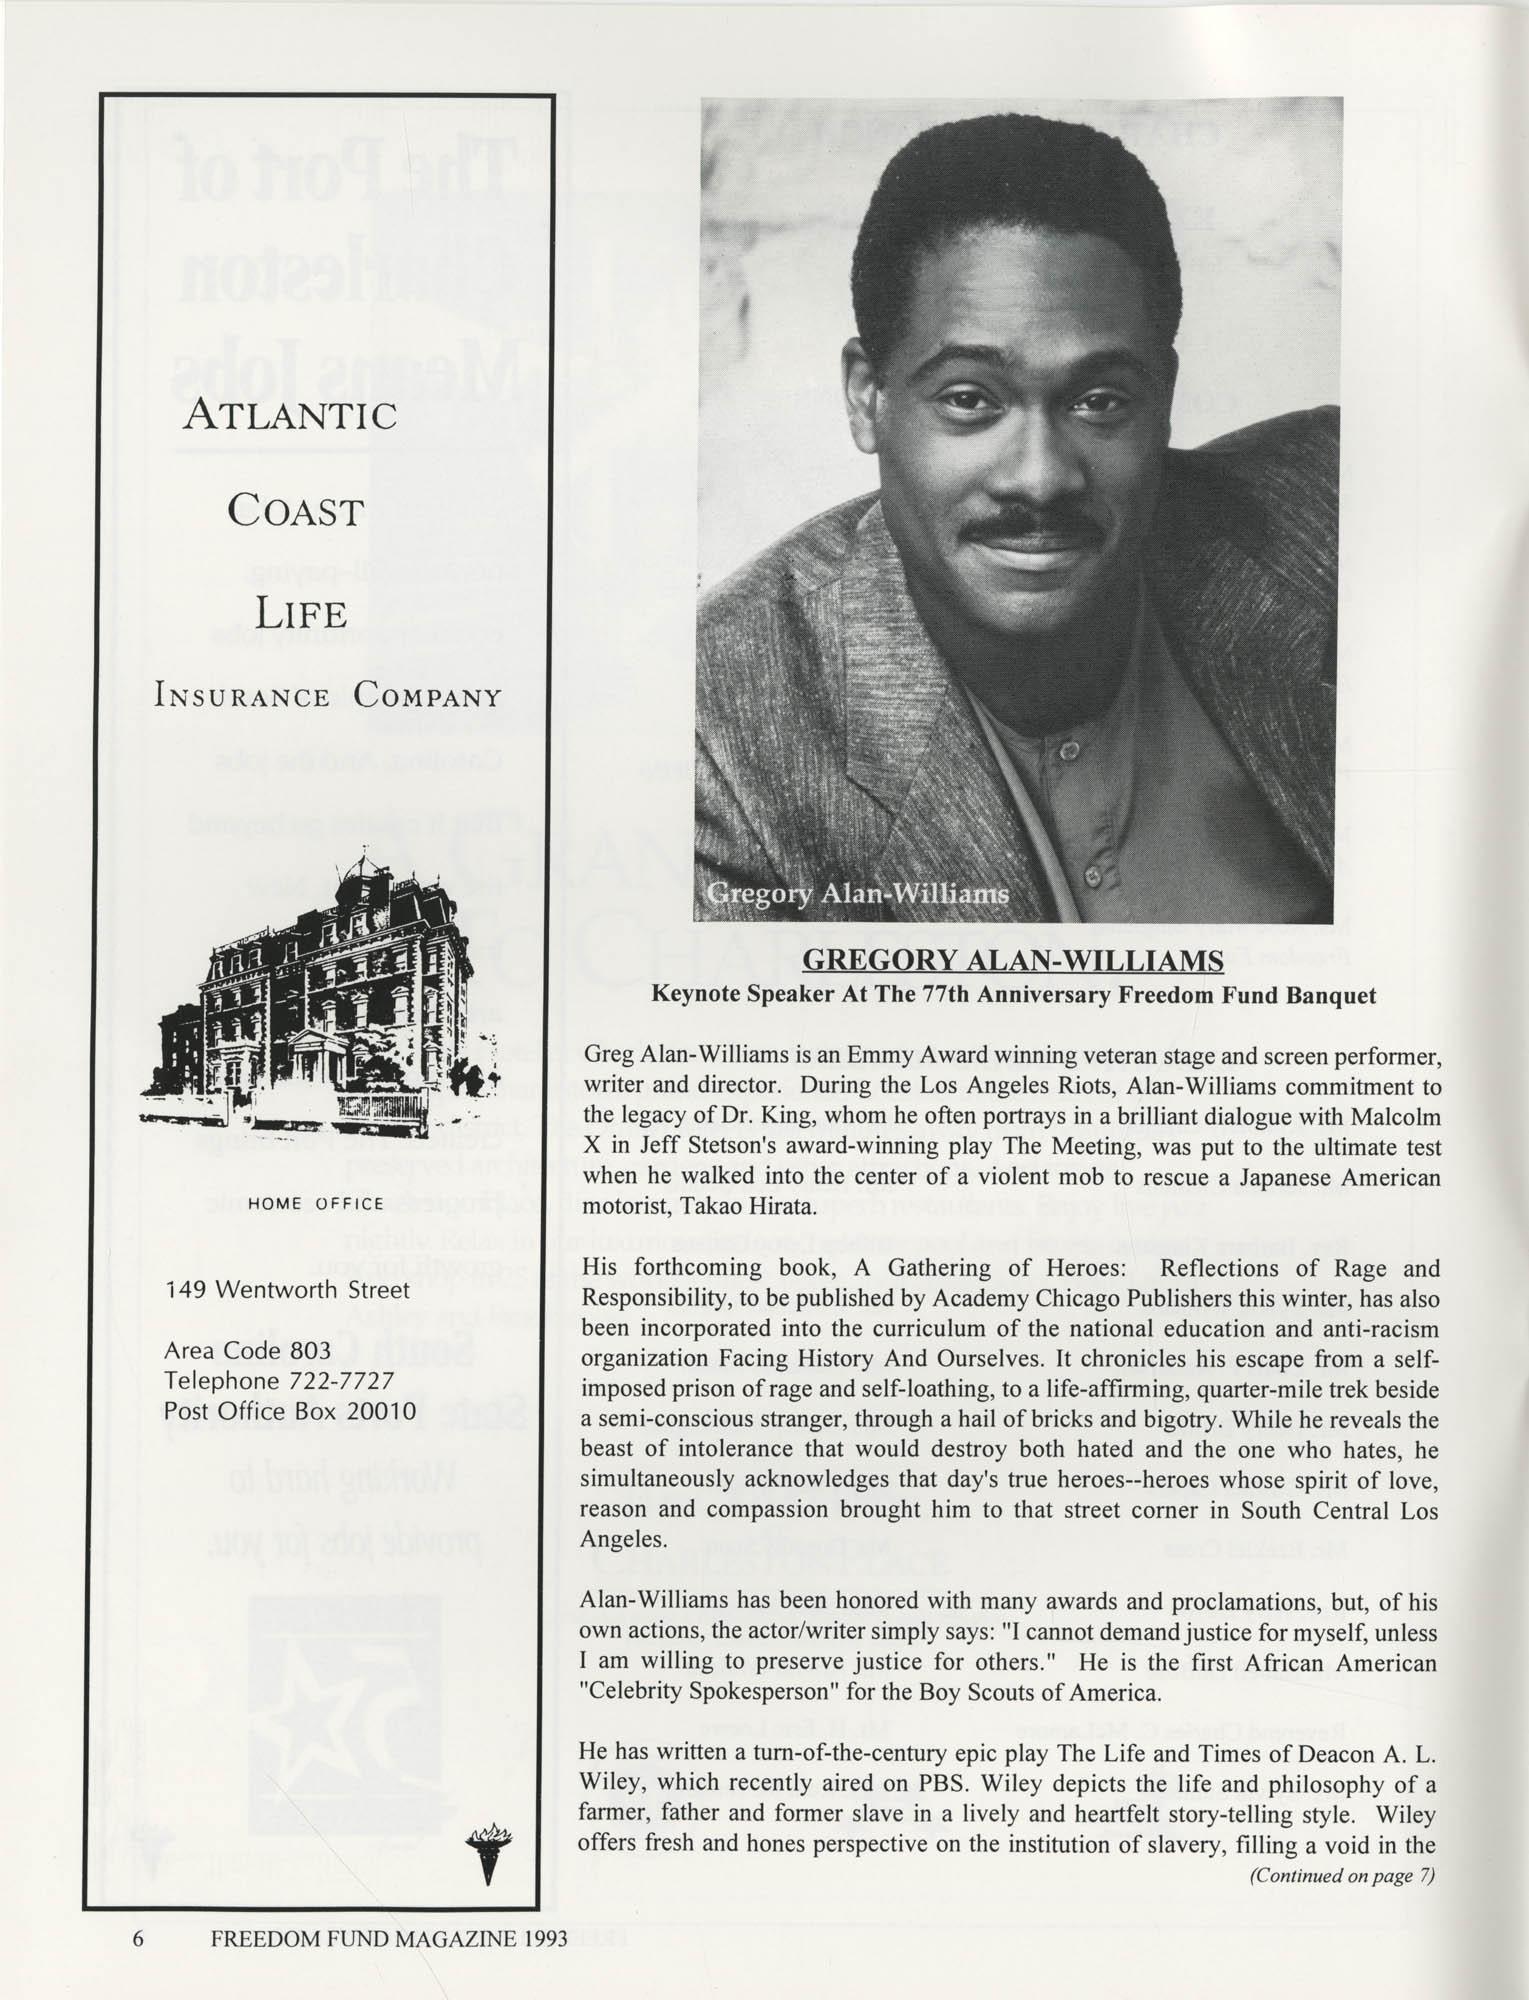 Freedom Fund Magazine, 1993, Page 6